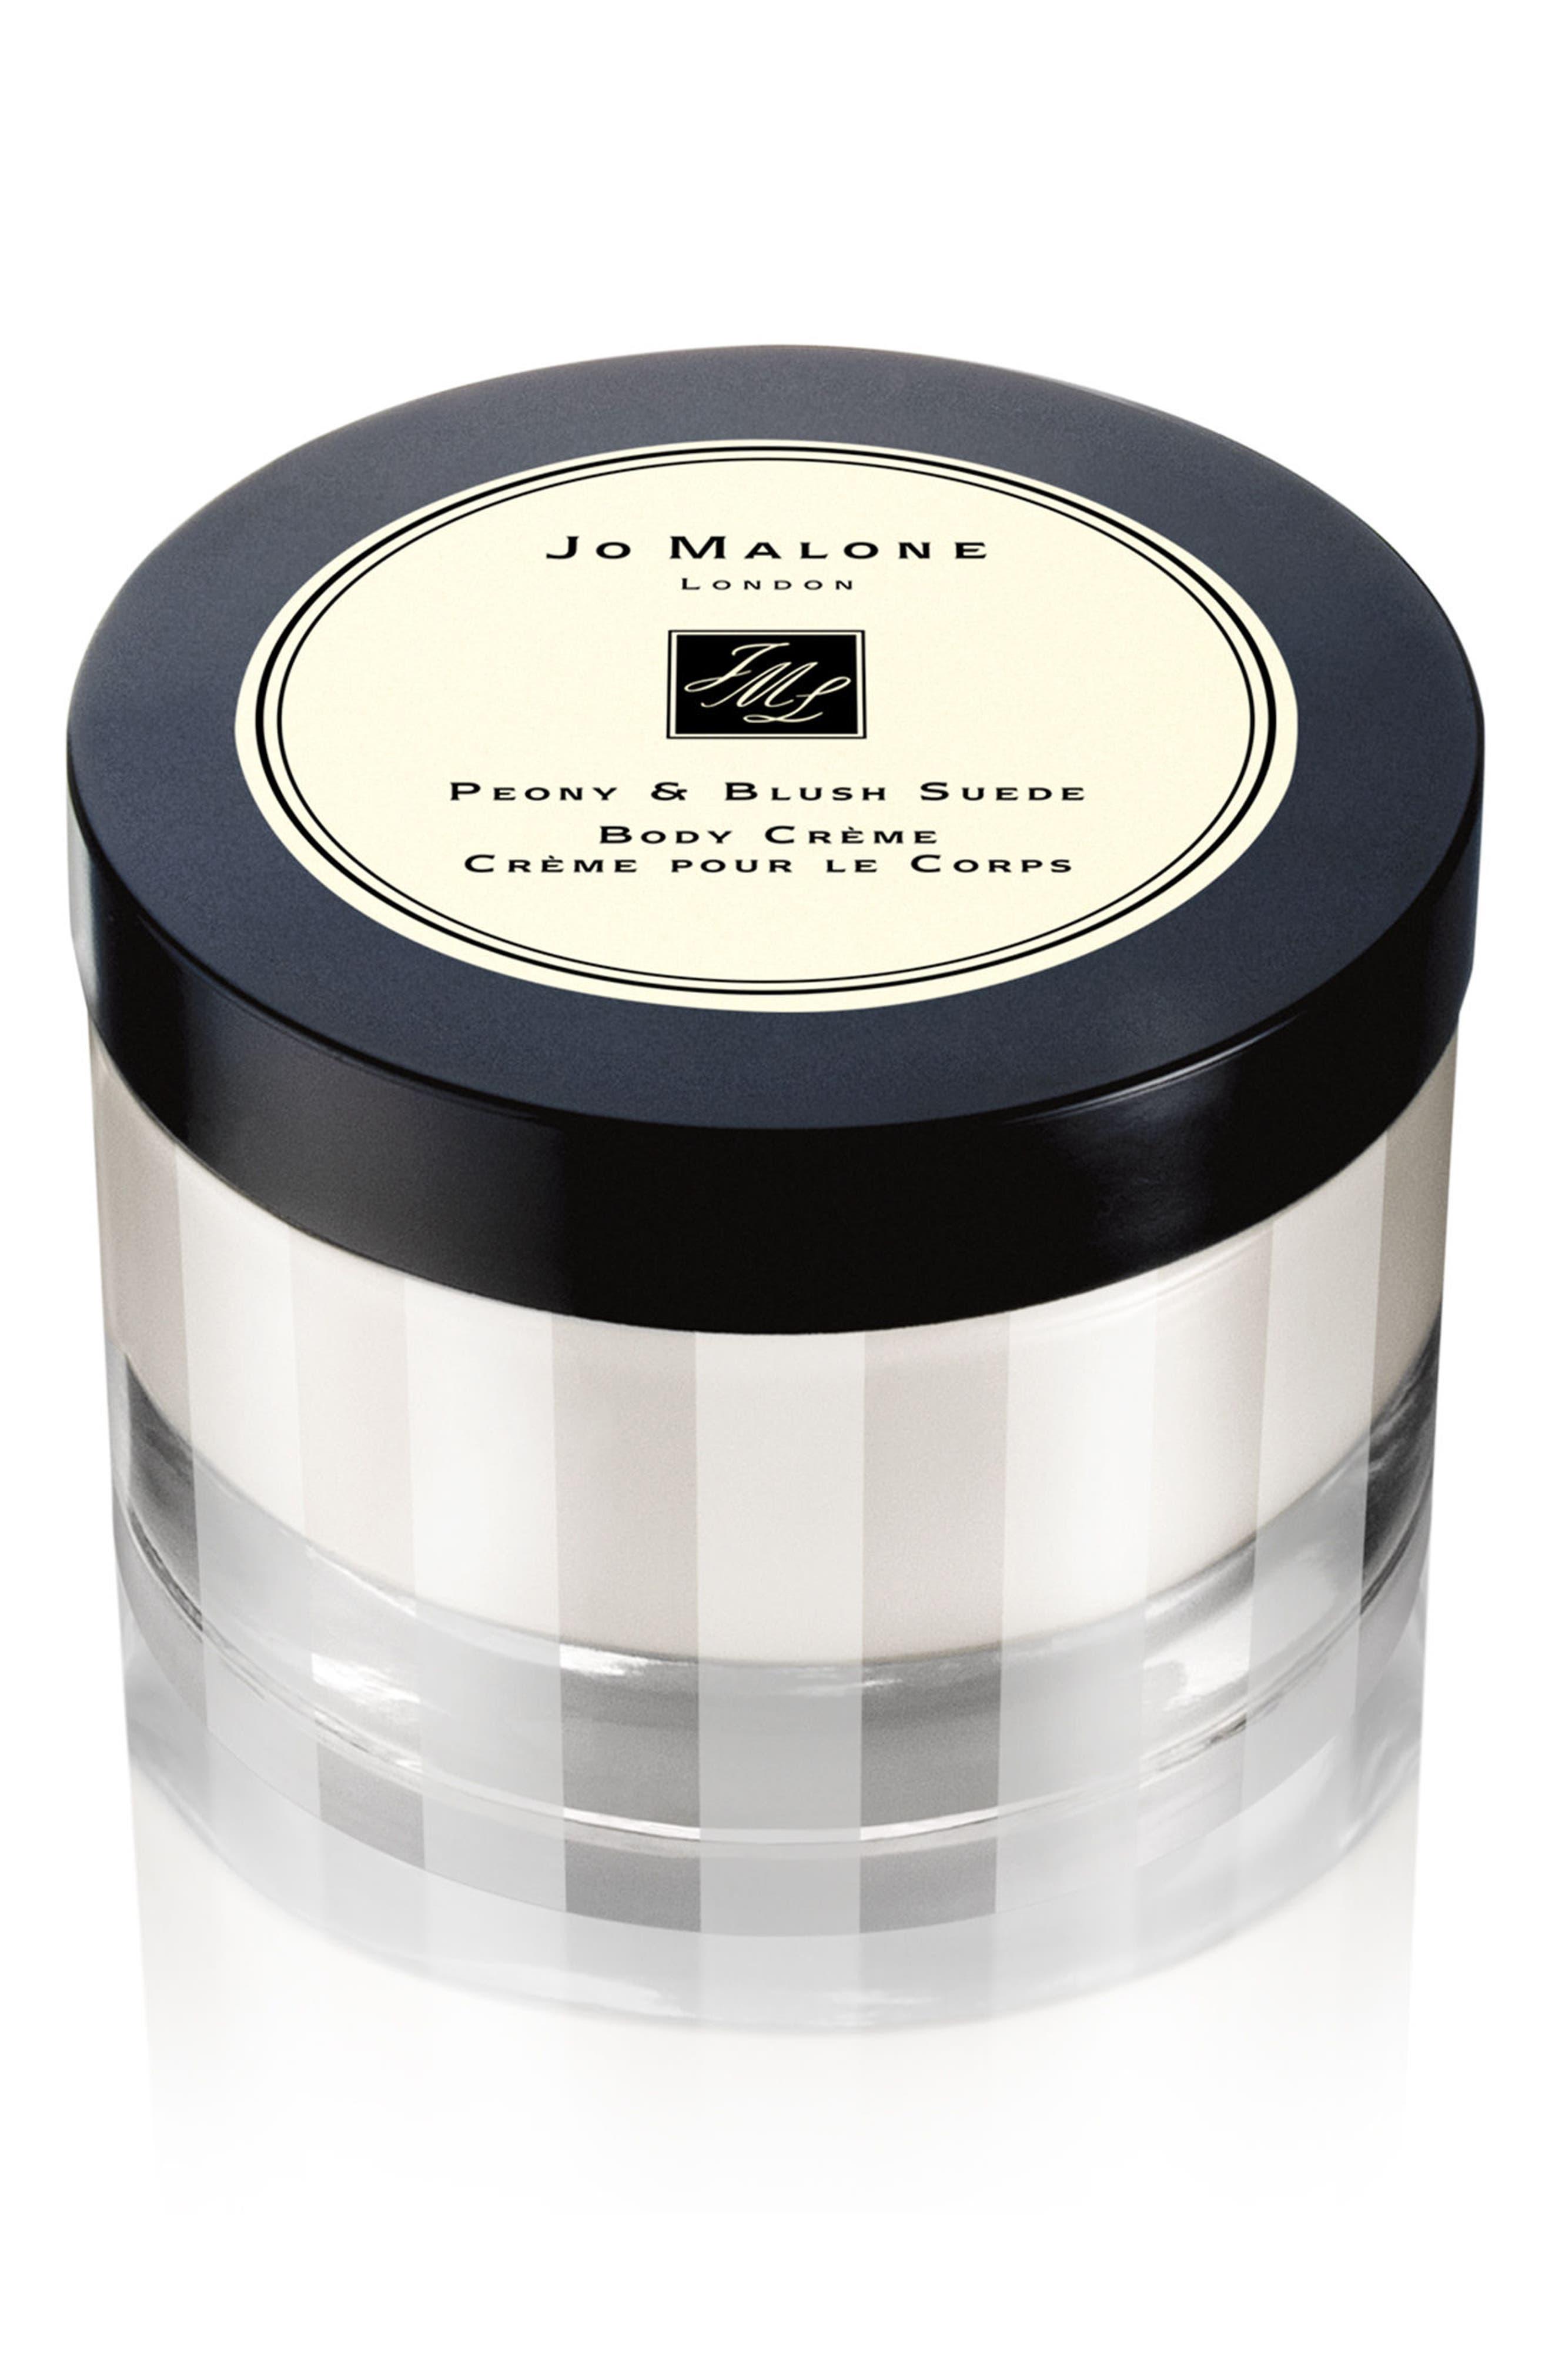 JO MALONE LONDON<SUP>™</SUP>, Peony & Blush Suede Body Crème, Main thumbnail 1, color, NO COLOR